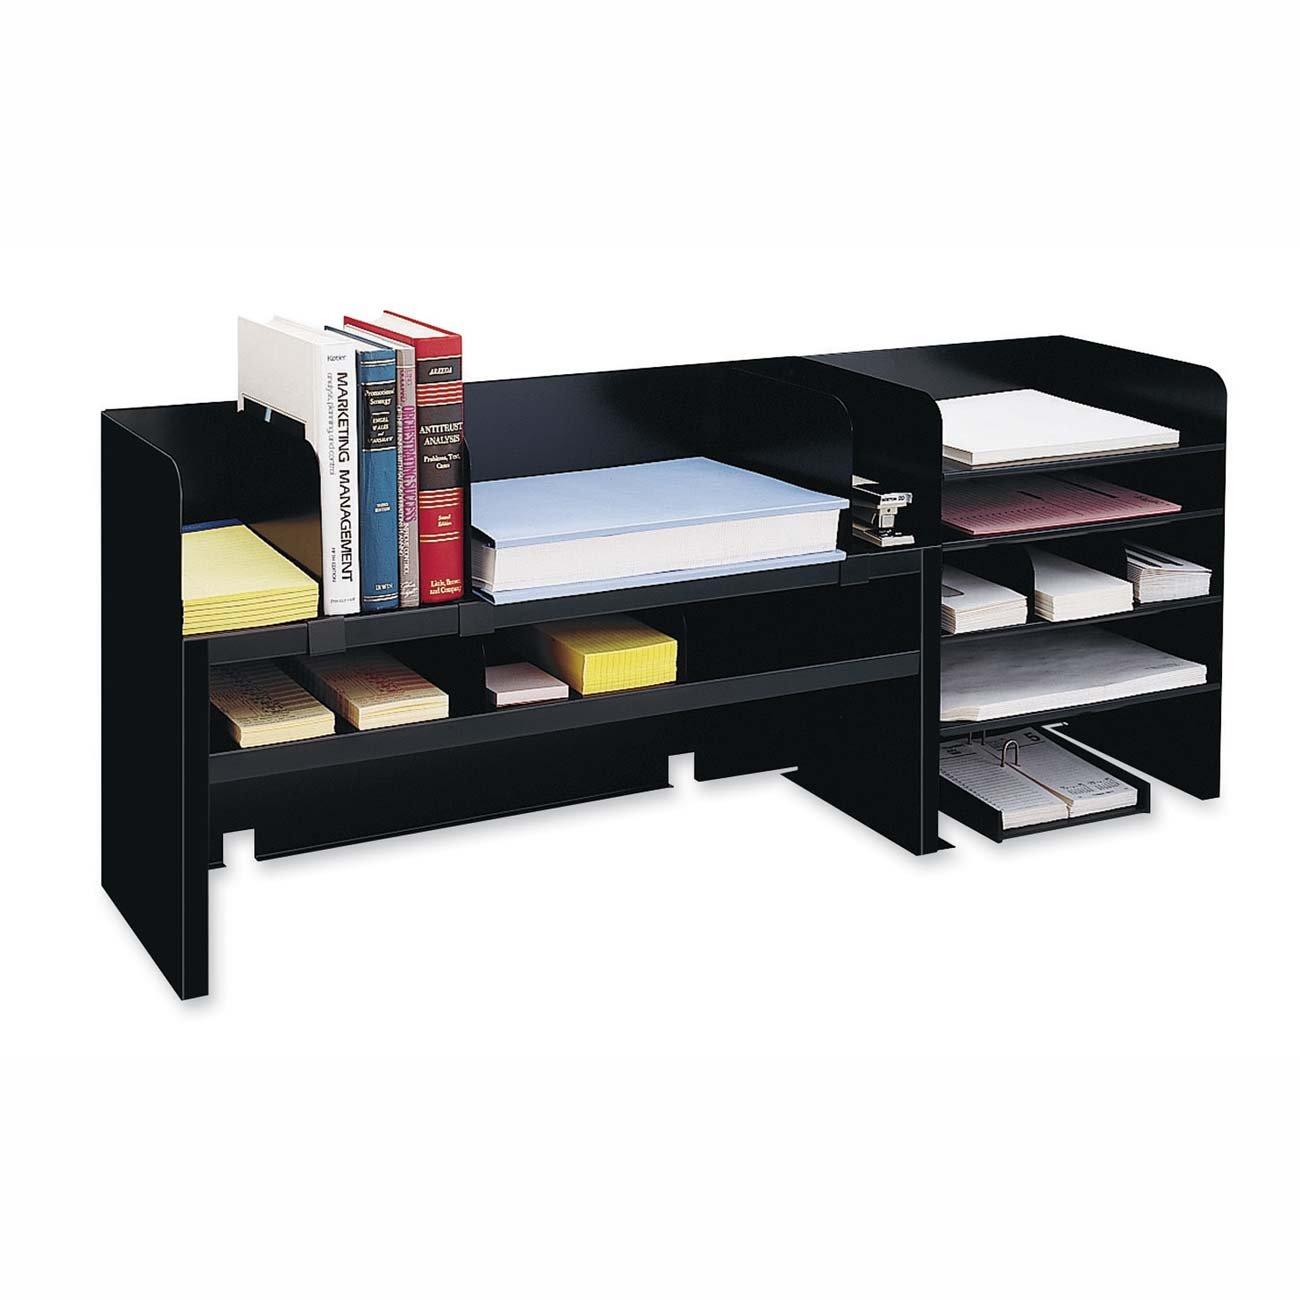 MMF2061DOBK - MMF Raised Shelf Design Desk Organizer